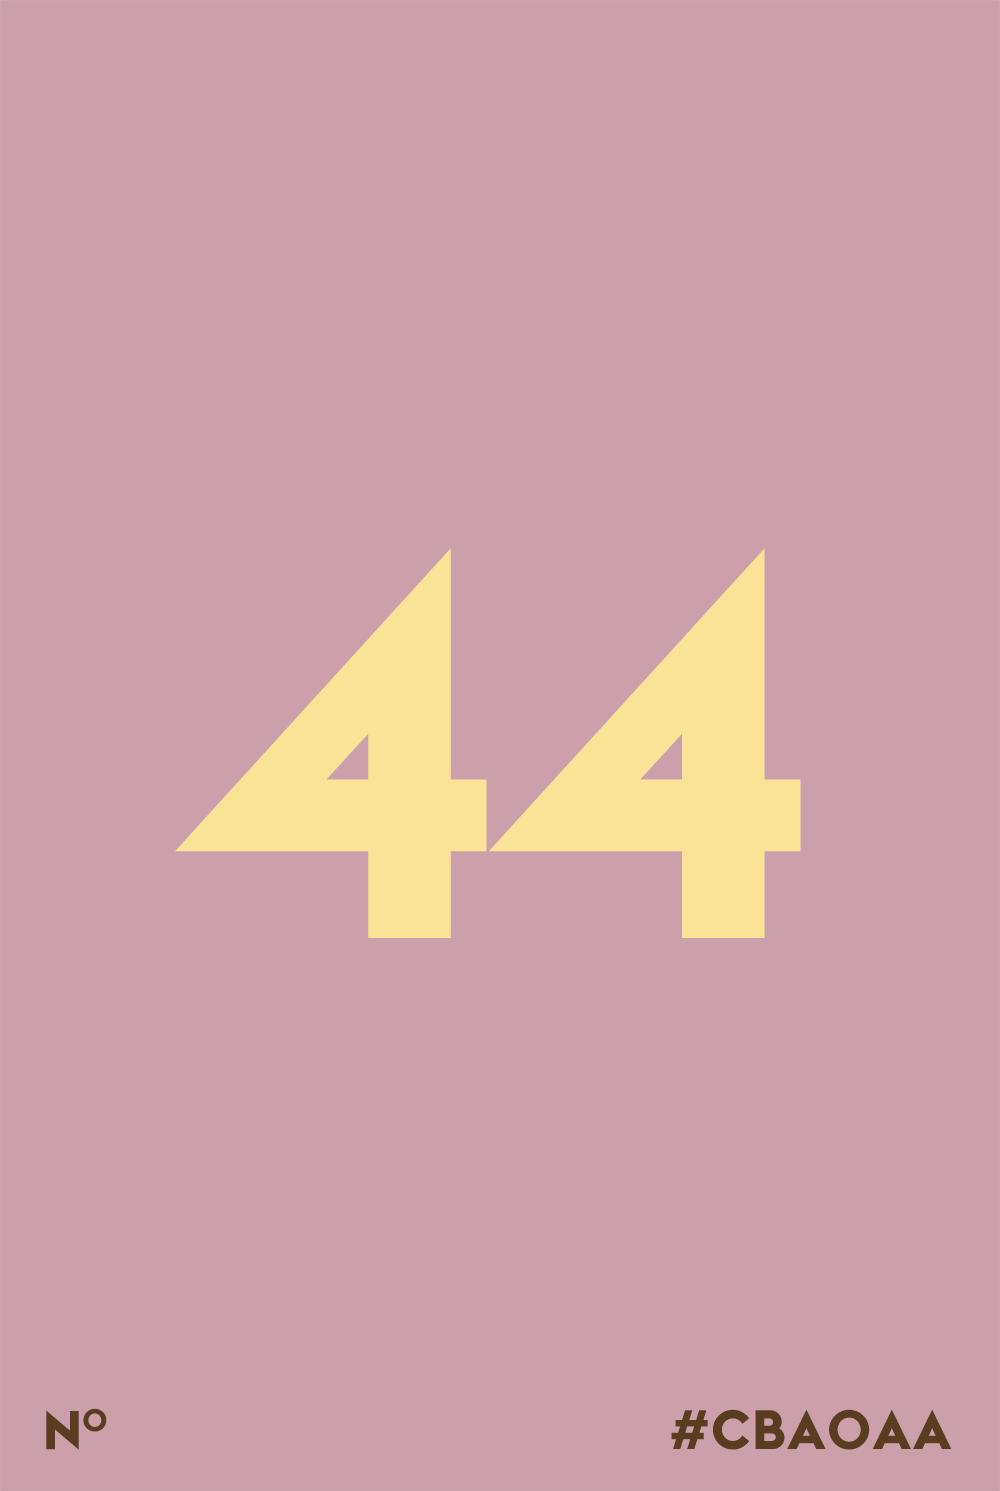 cc_0043_44